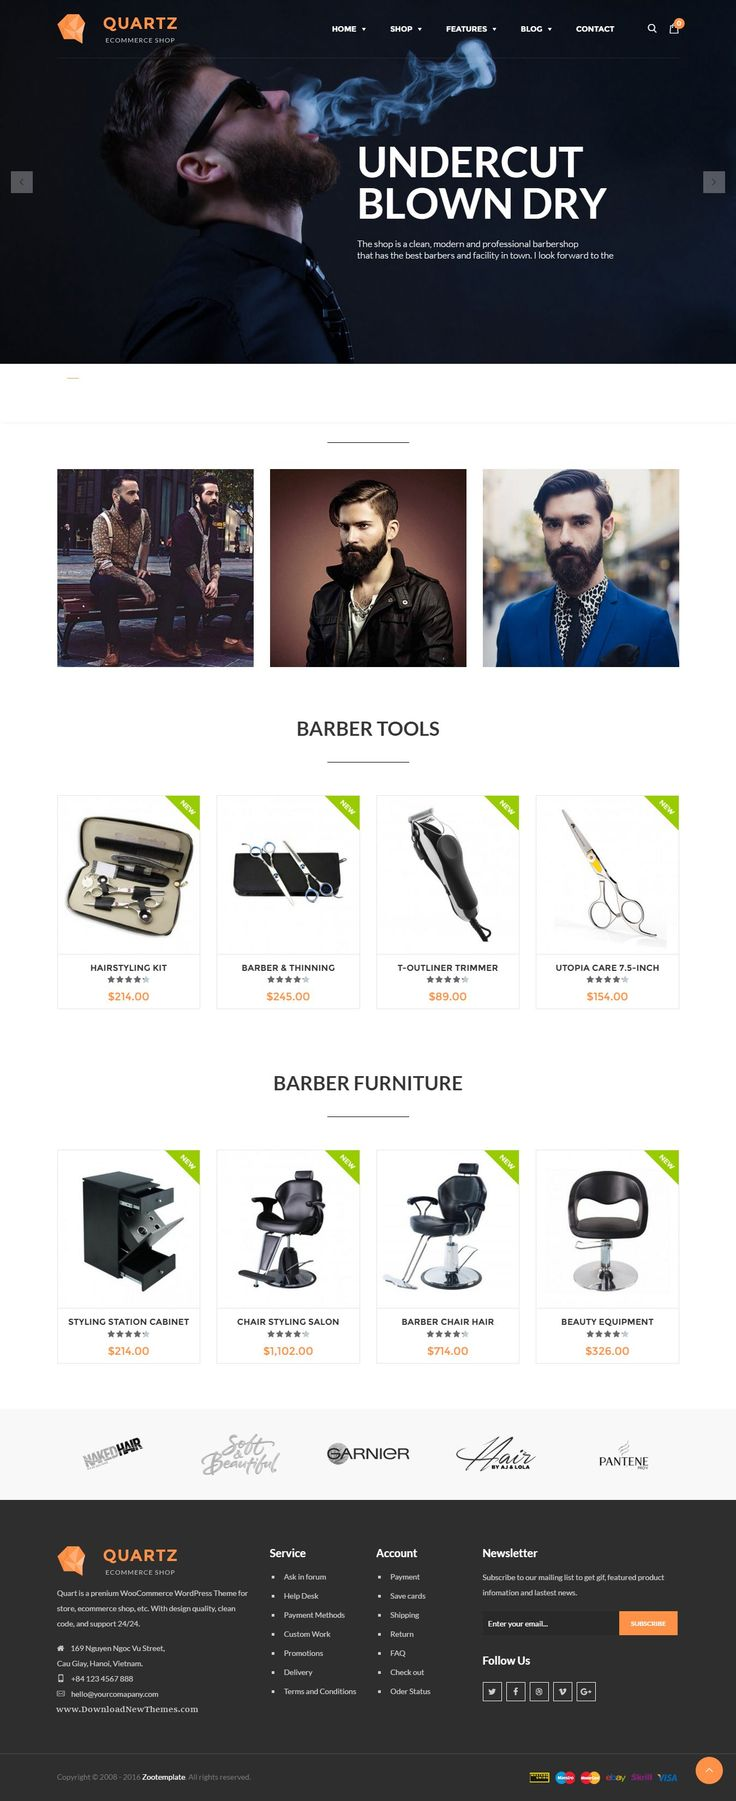 Ri Quartz - Responsive Multipurpose WooCommerce Theme Demo #Barbra #hairstyle #website